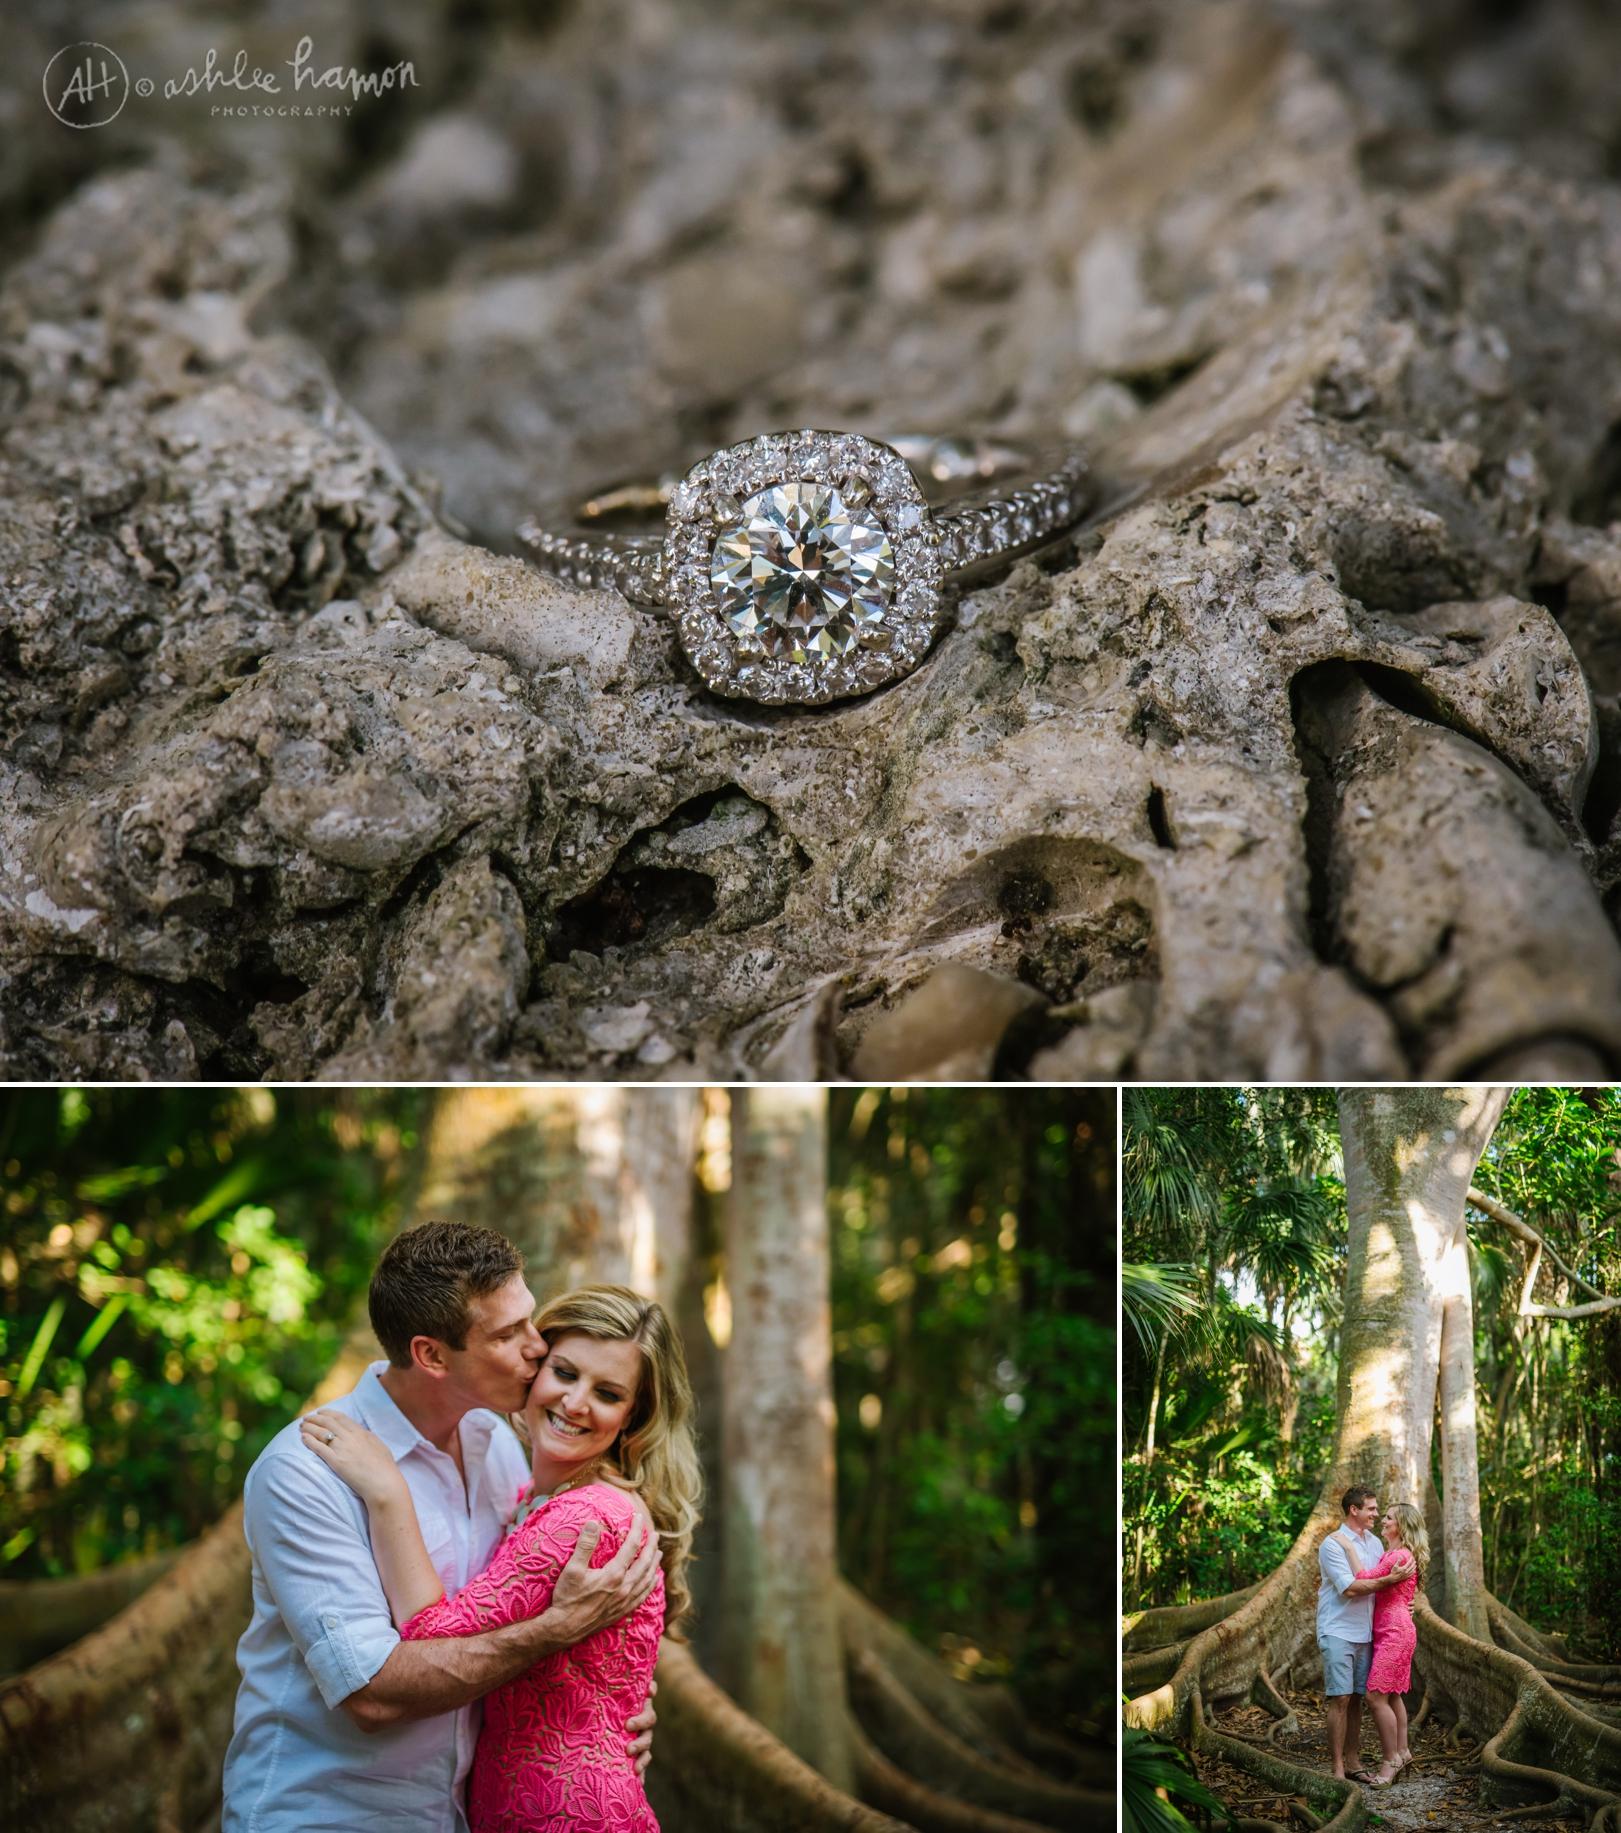 tampa-wedding-photographer-engagement-nature-outdoor-florida_0000.jpg